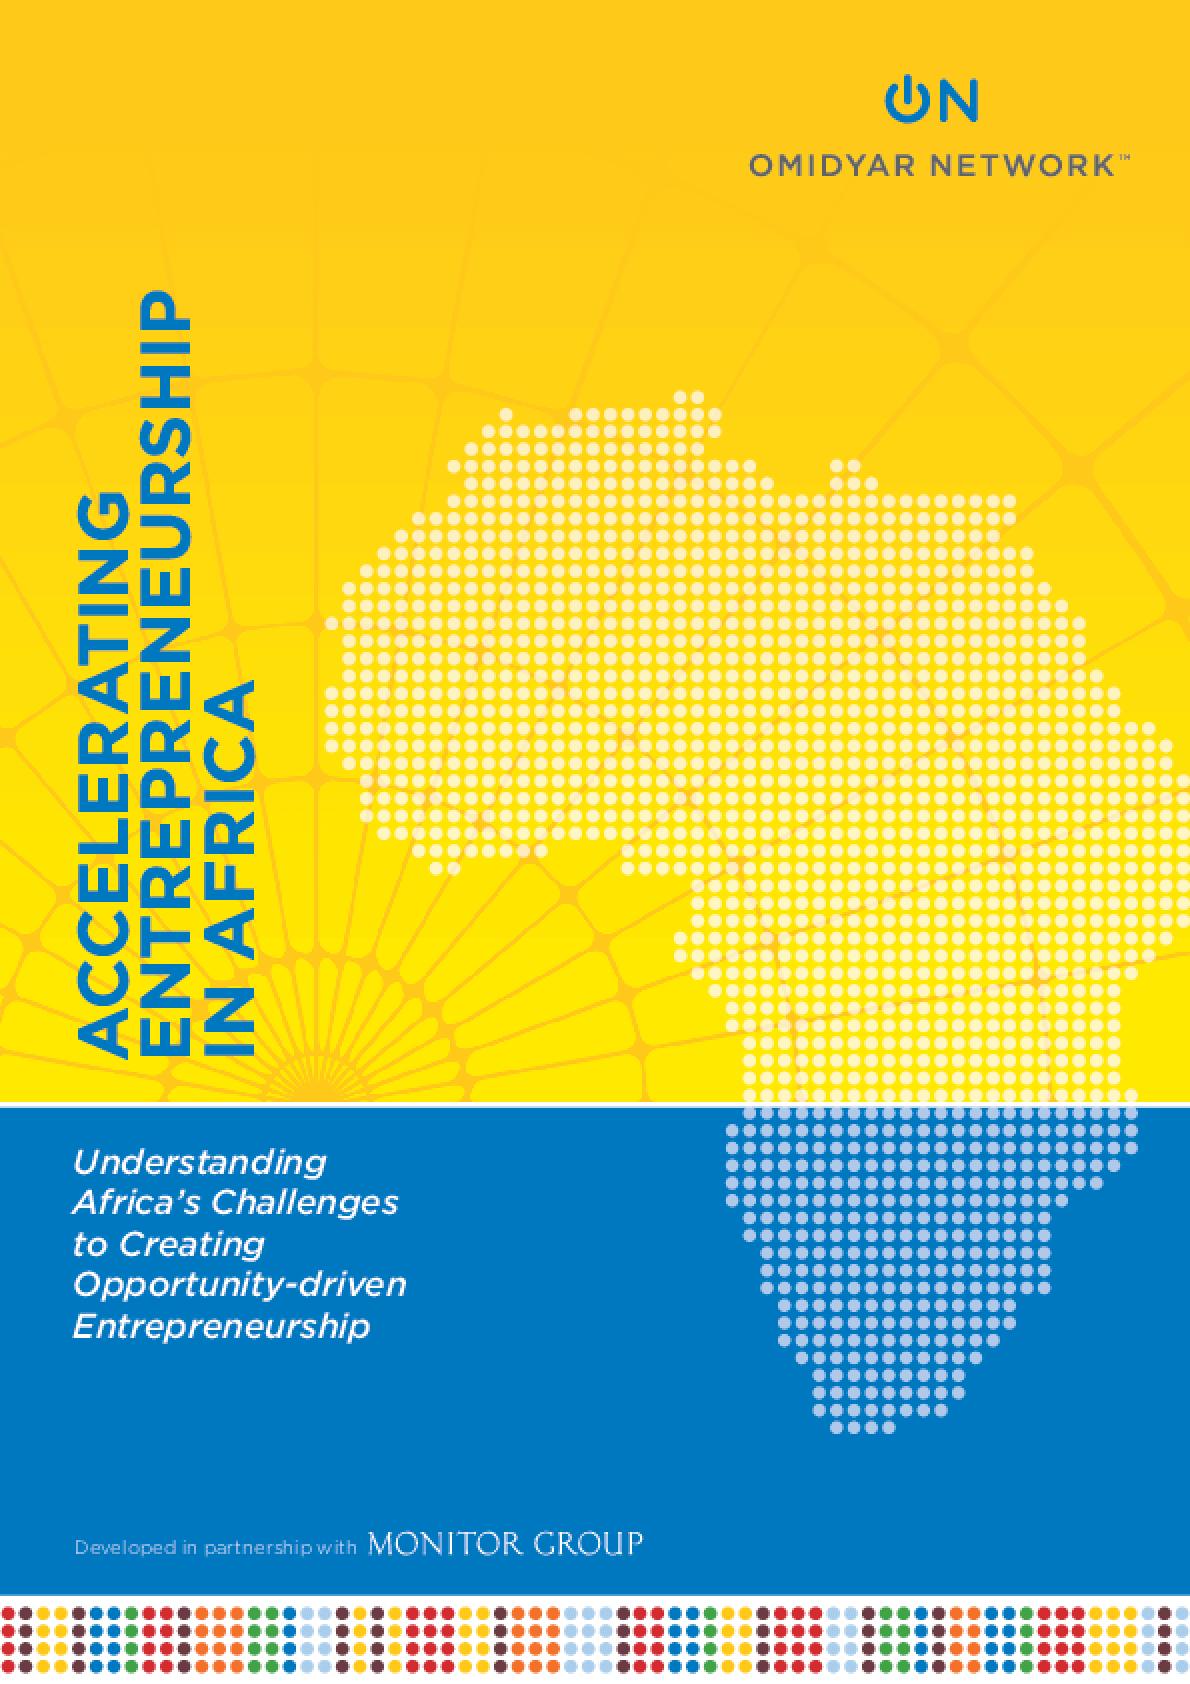 Accelerating Entrepreneurship in Africa: Understanding Africa's Challenges to Creating Opportunity-Driven Entrepreneurship